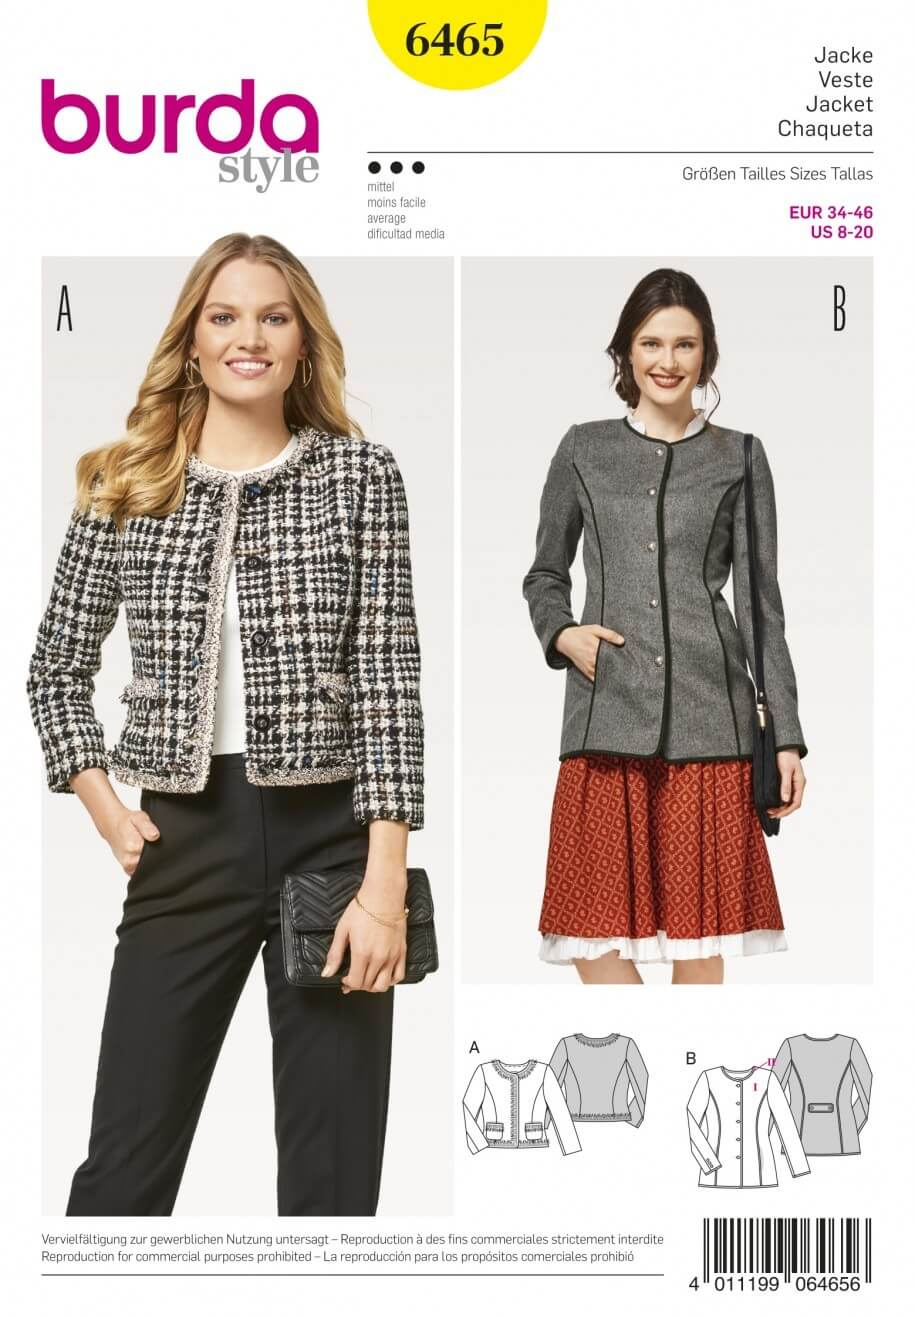 Burda Style Women's Collarless Jacket Coat Sewing Pattern 6465